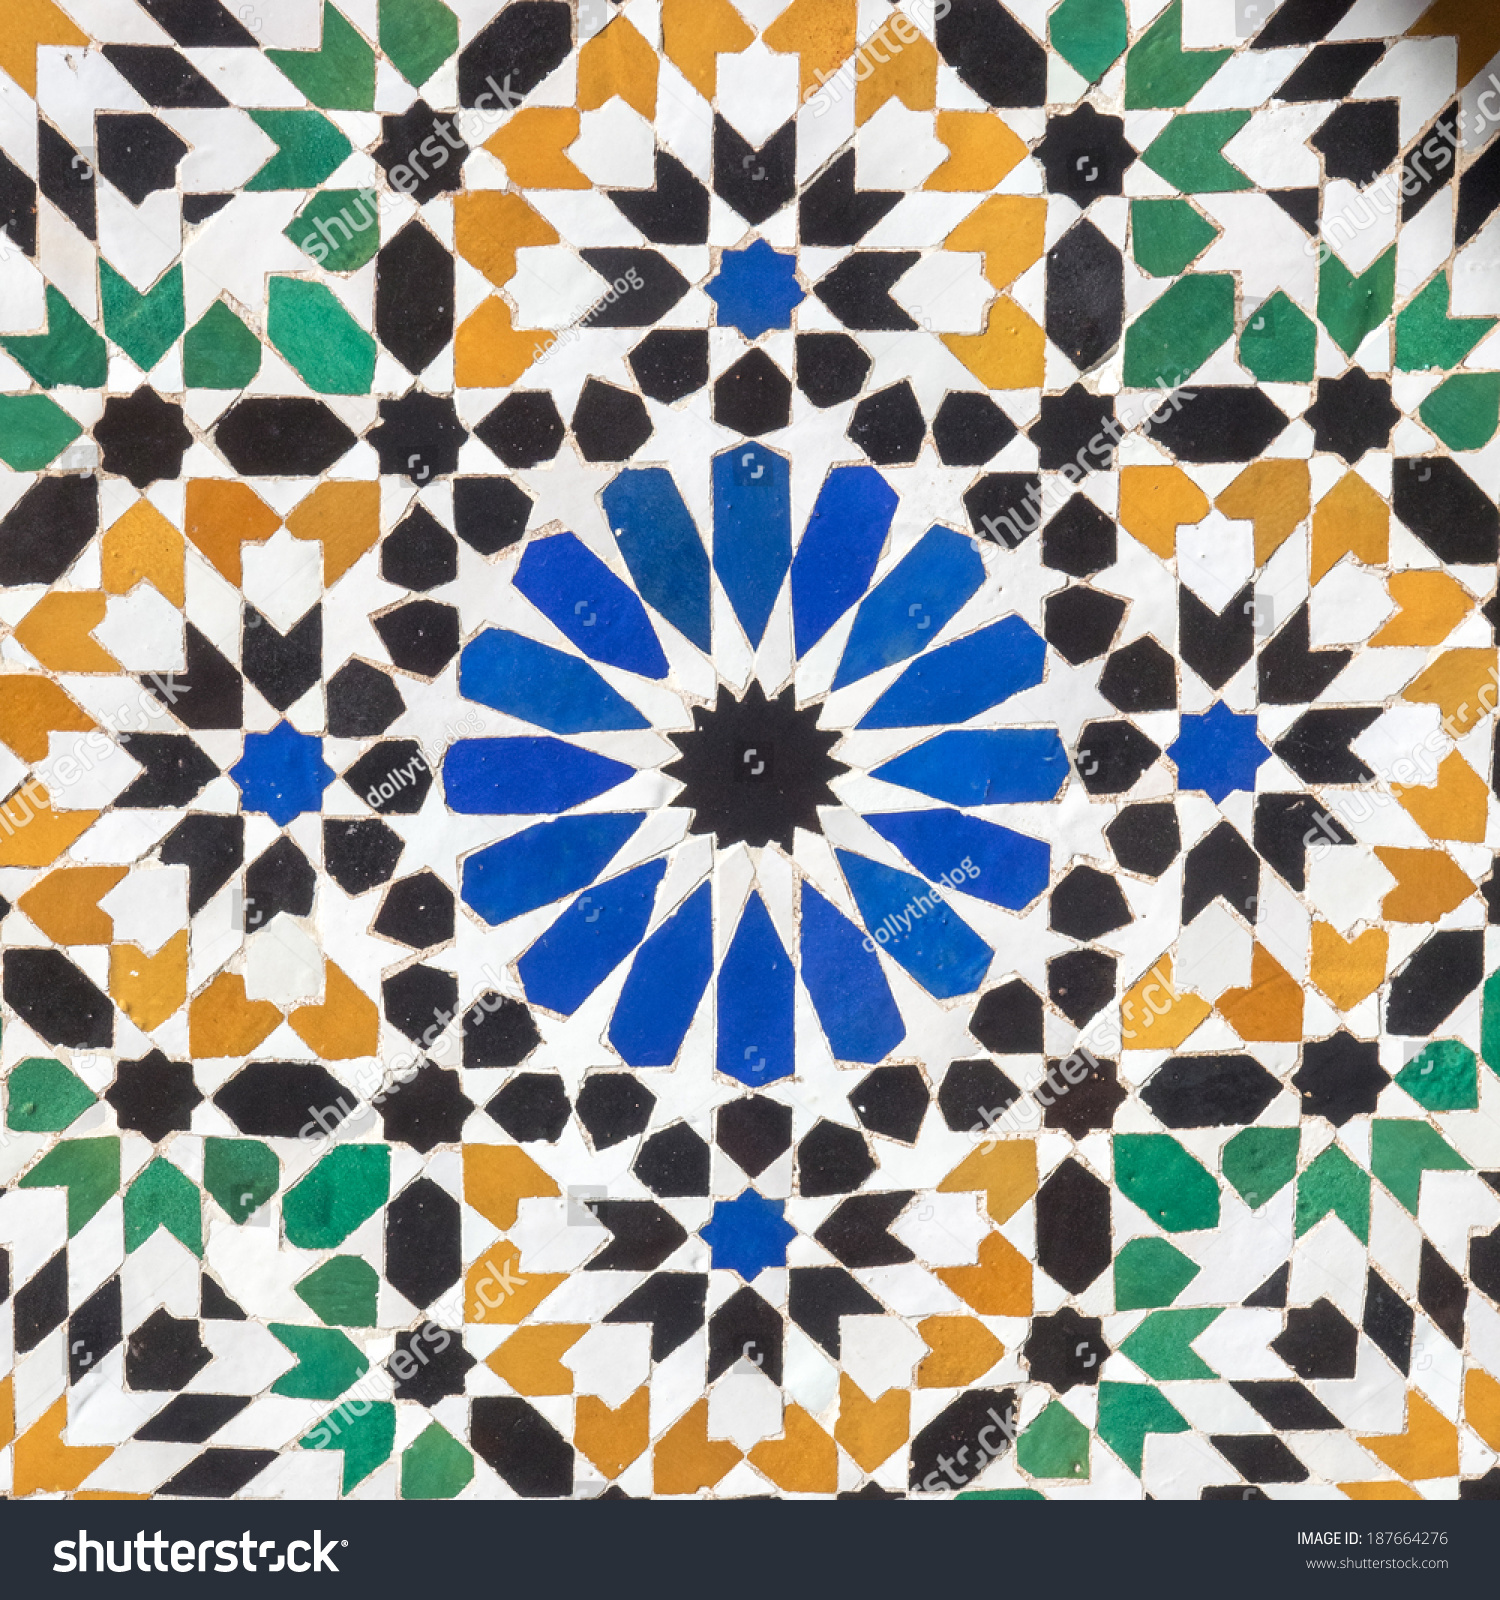 Islamic Mosaic Floor Tiles Stock Photo 187664276 - Shutterstock